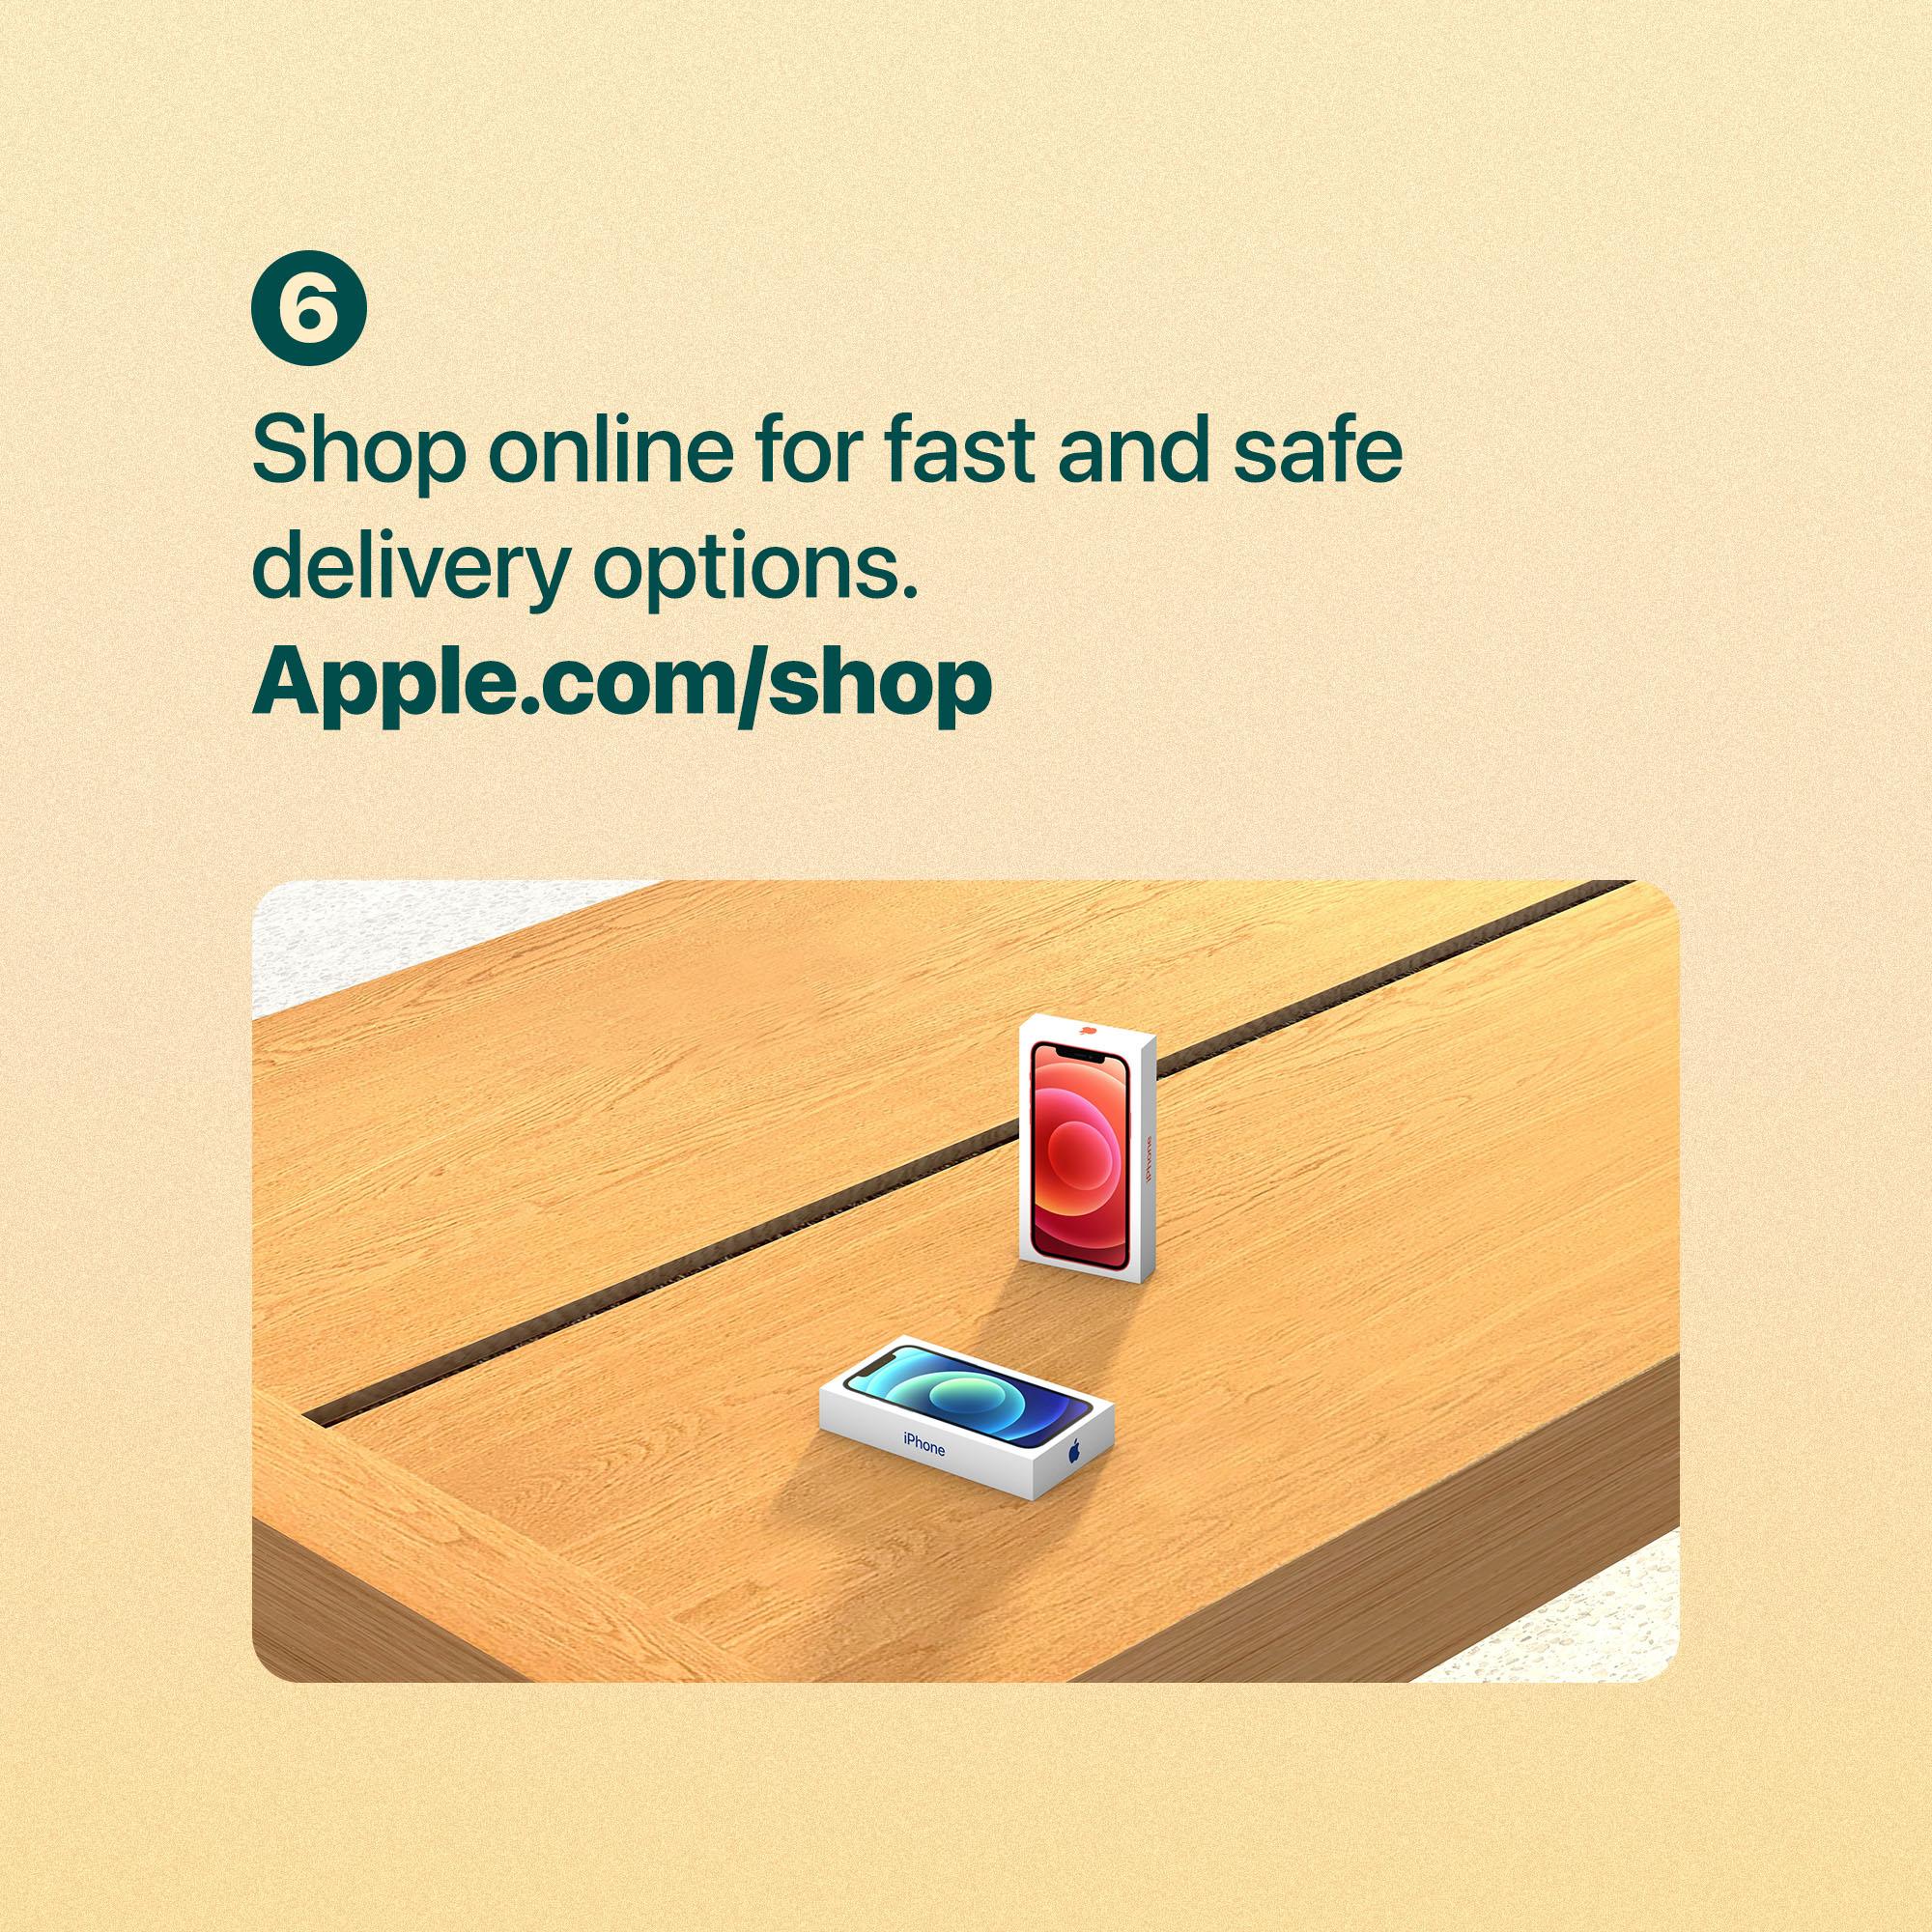 Shop online for fast and safe delivery options. Apple.com/shop.